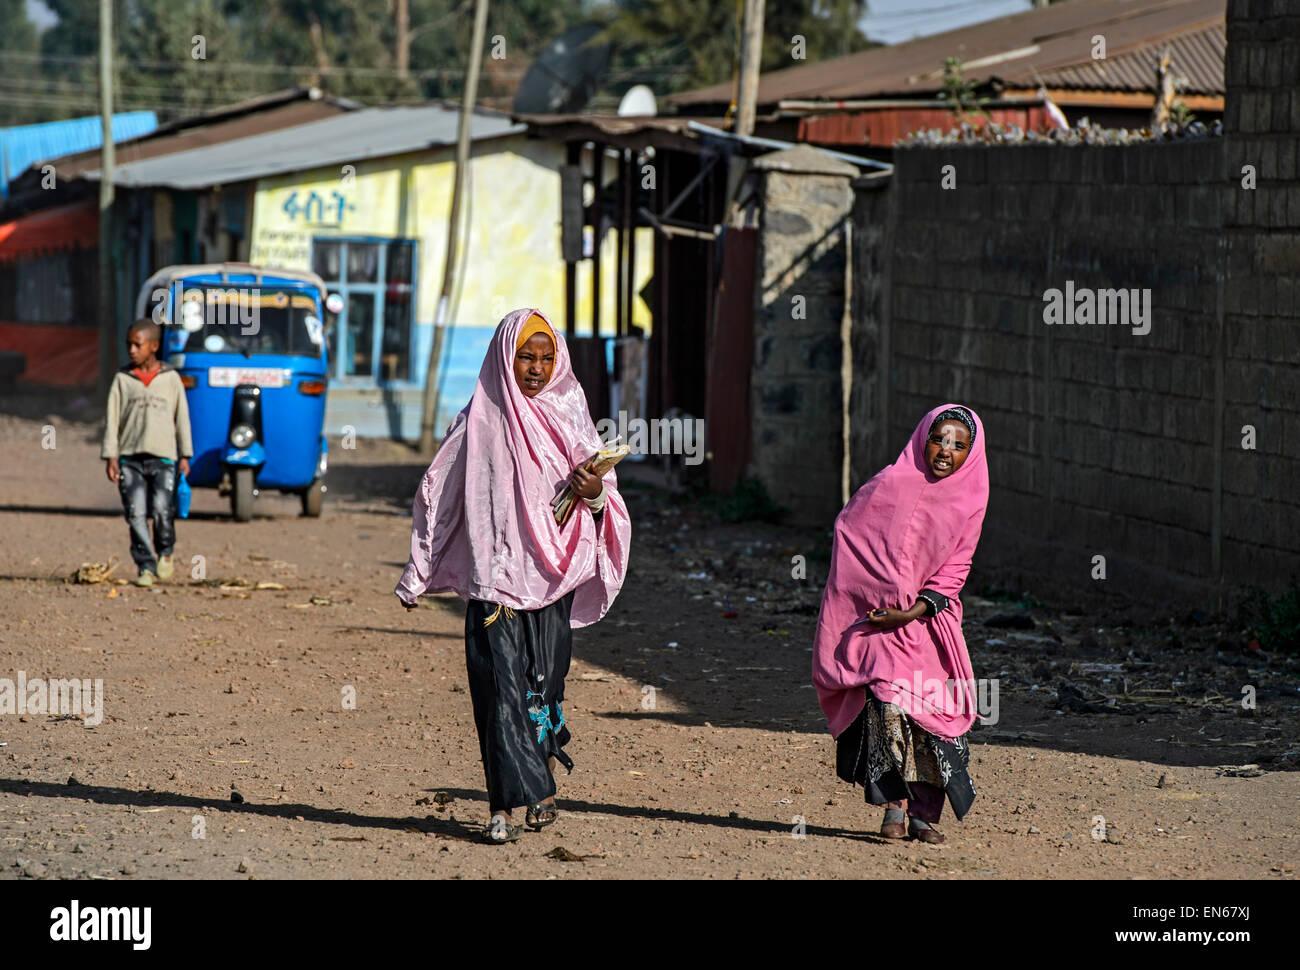 Muslim girls on their way to school in the morning, Goba, Bale area, Oromiya, Ethiopia - Stock Image